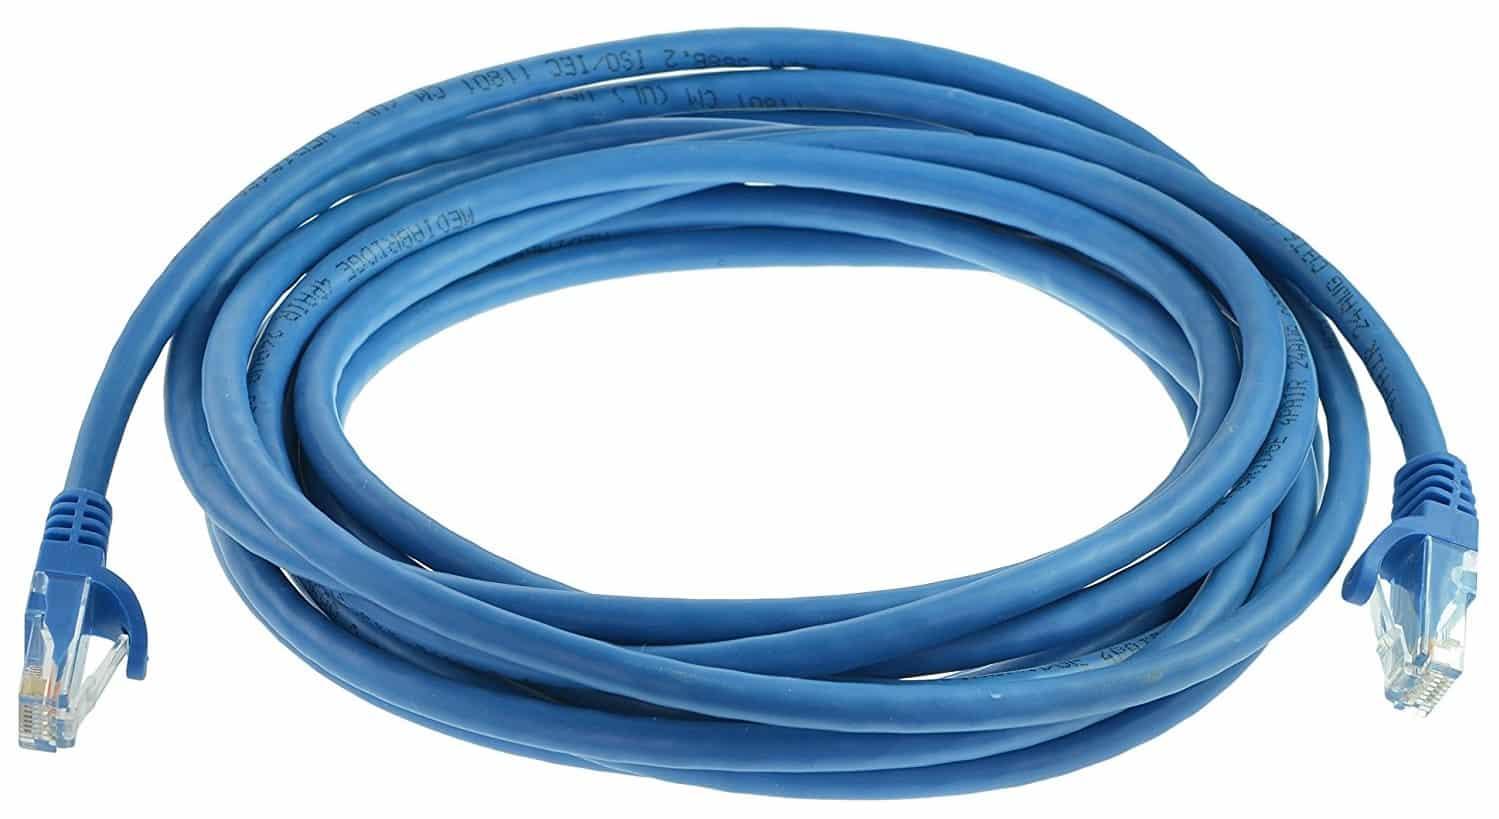 Mediabridge Ethernet Cable